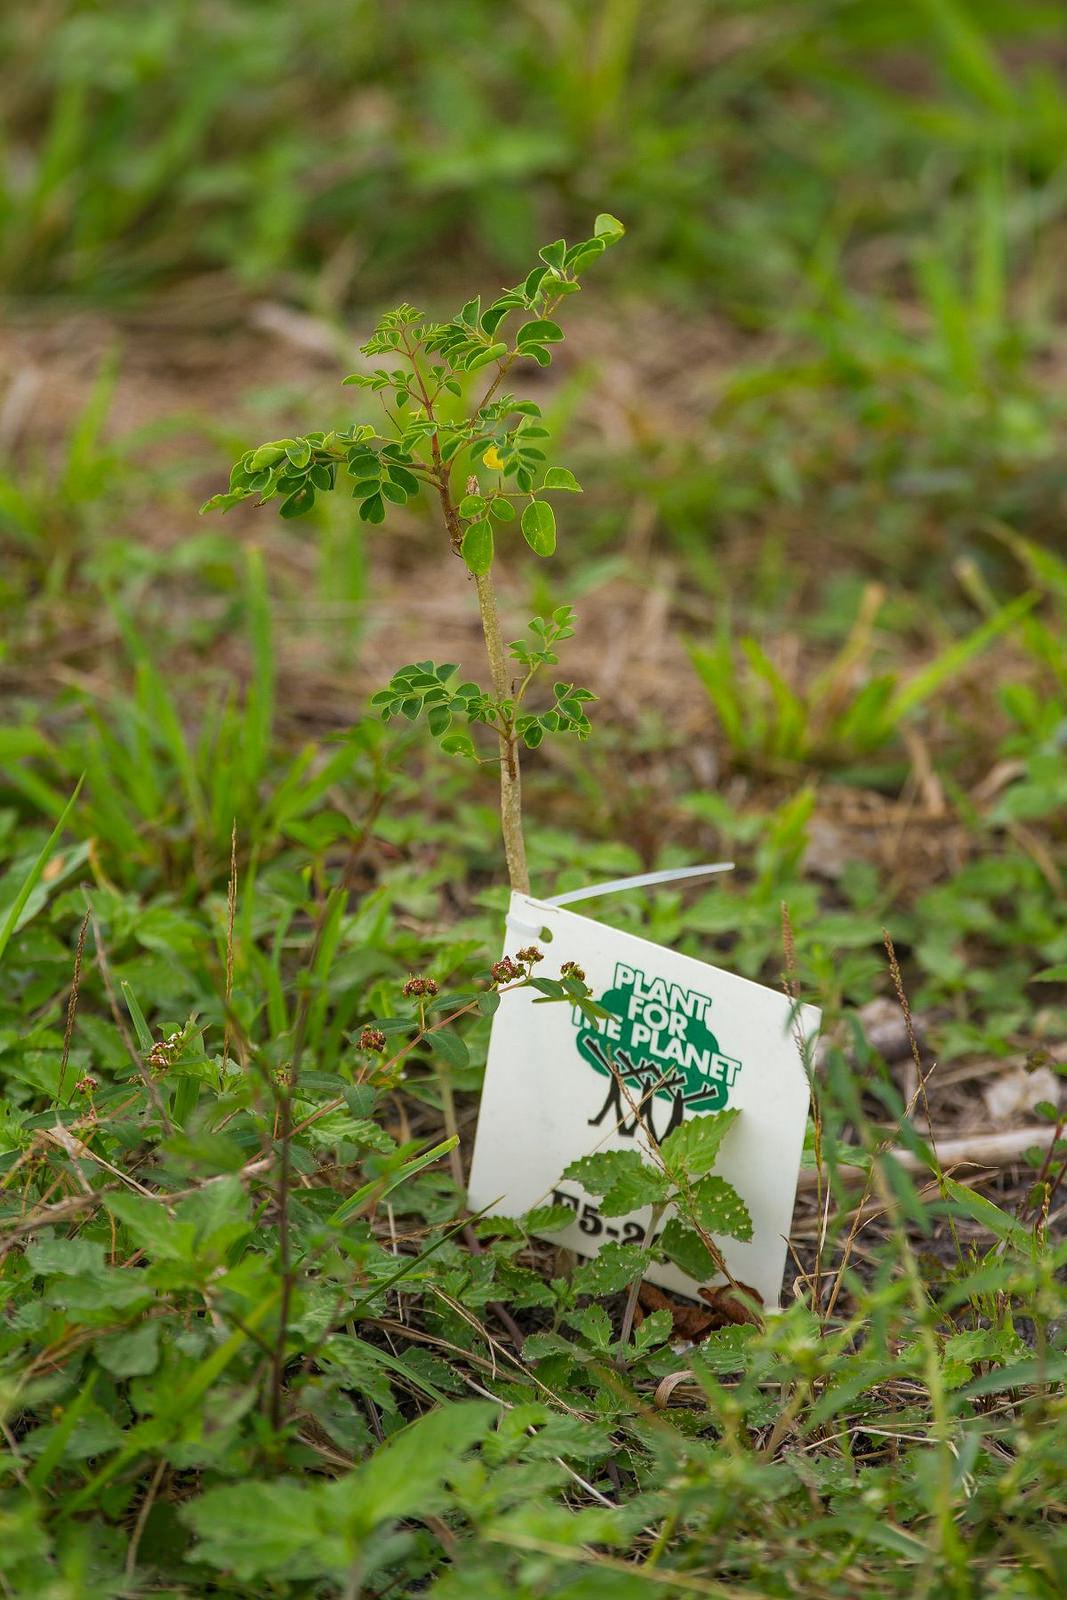 Plant-for-the-Planet -Bundesverdienstkreuz für Plant-for-the-planet & Soulcover wird klimaneutral bis 2020